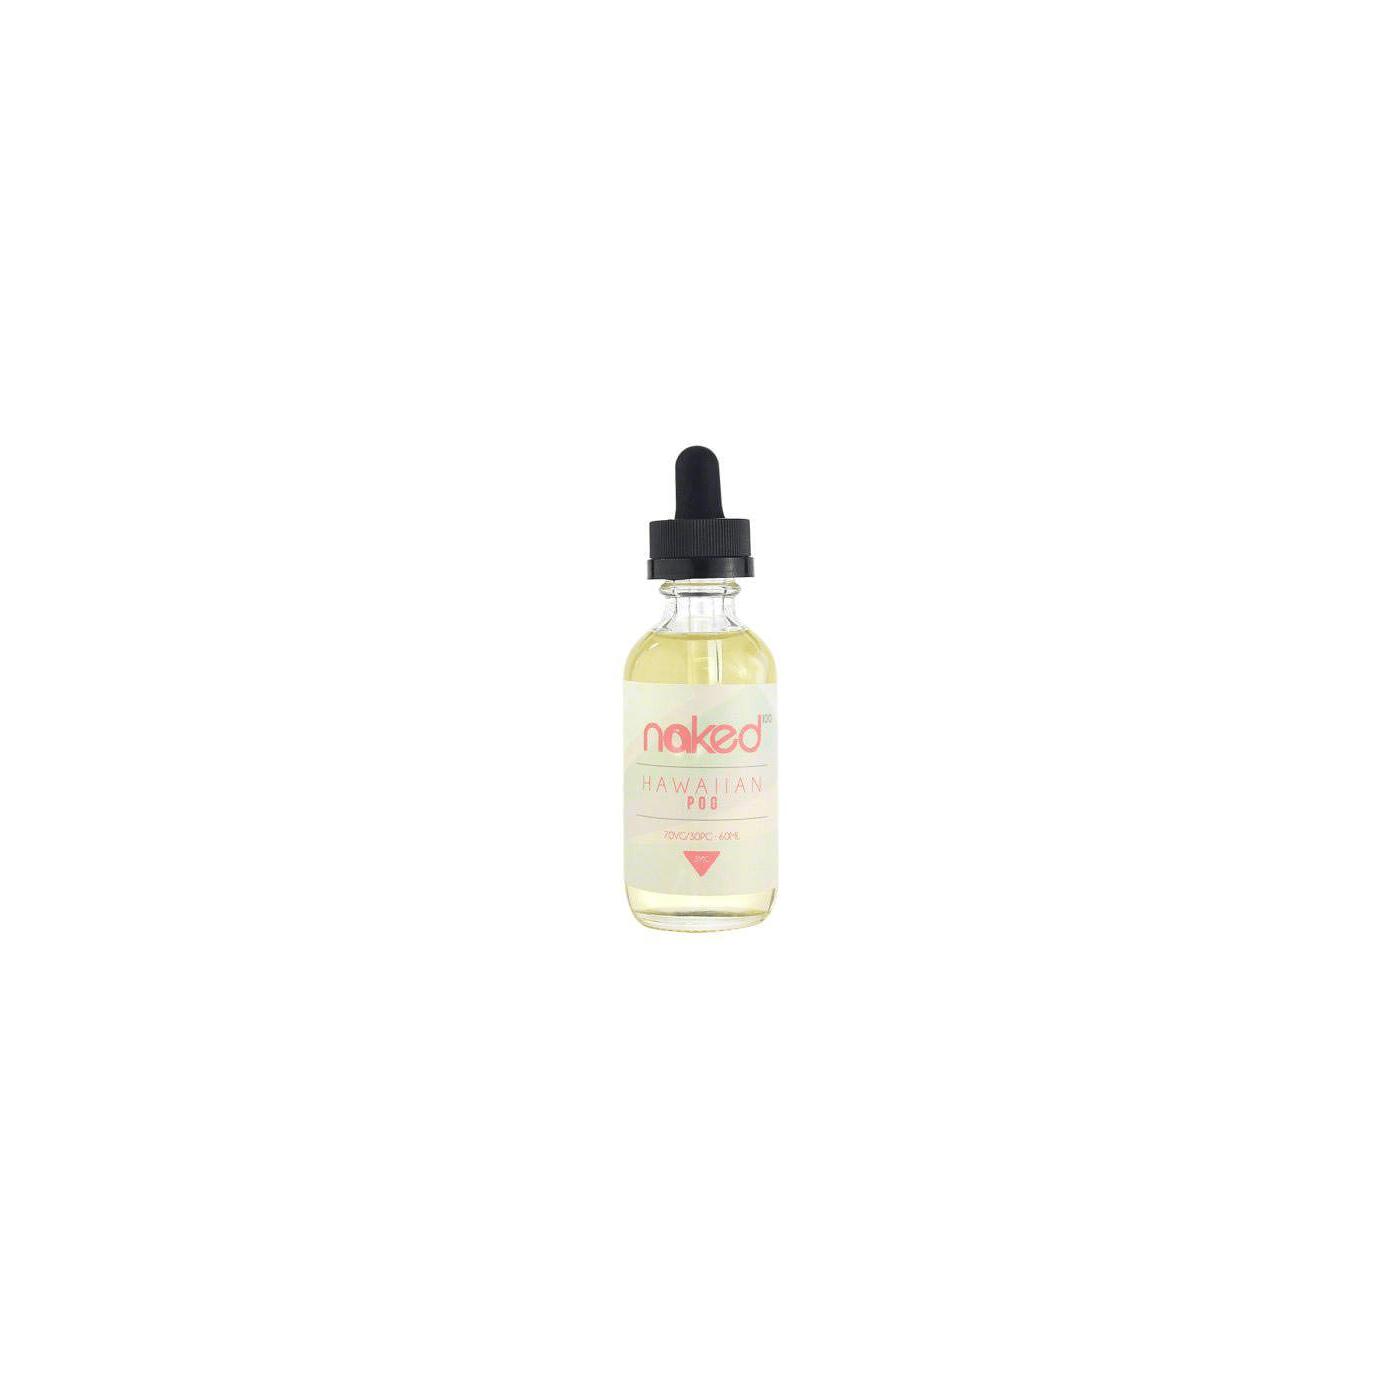 Naked 100 Hawaiian POG 60ml Vape Juice